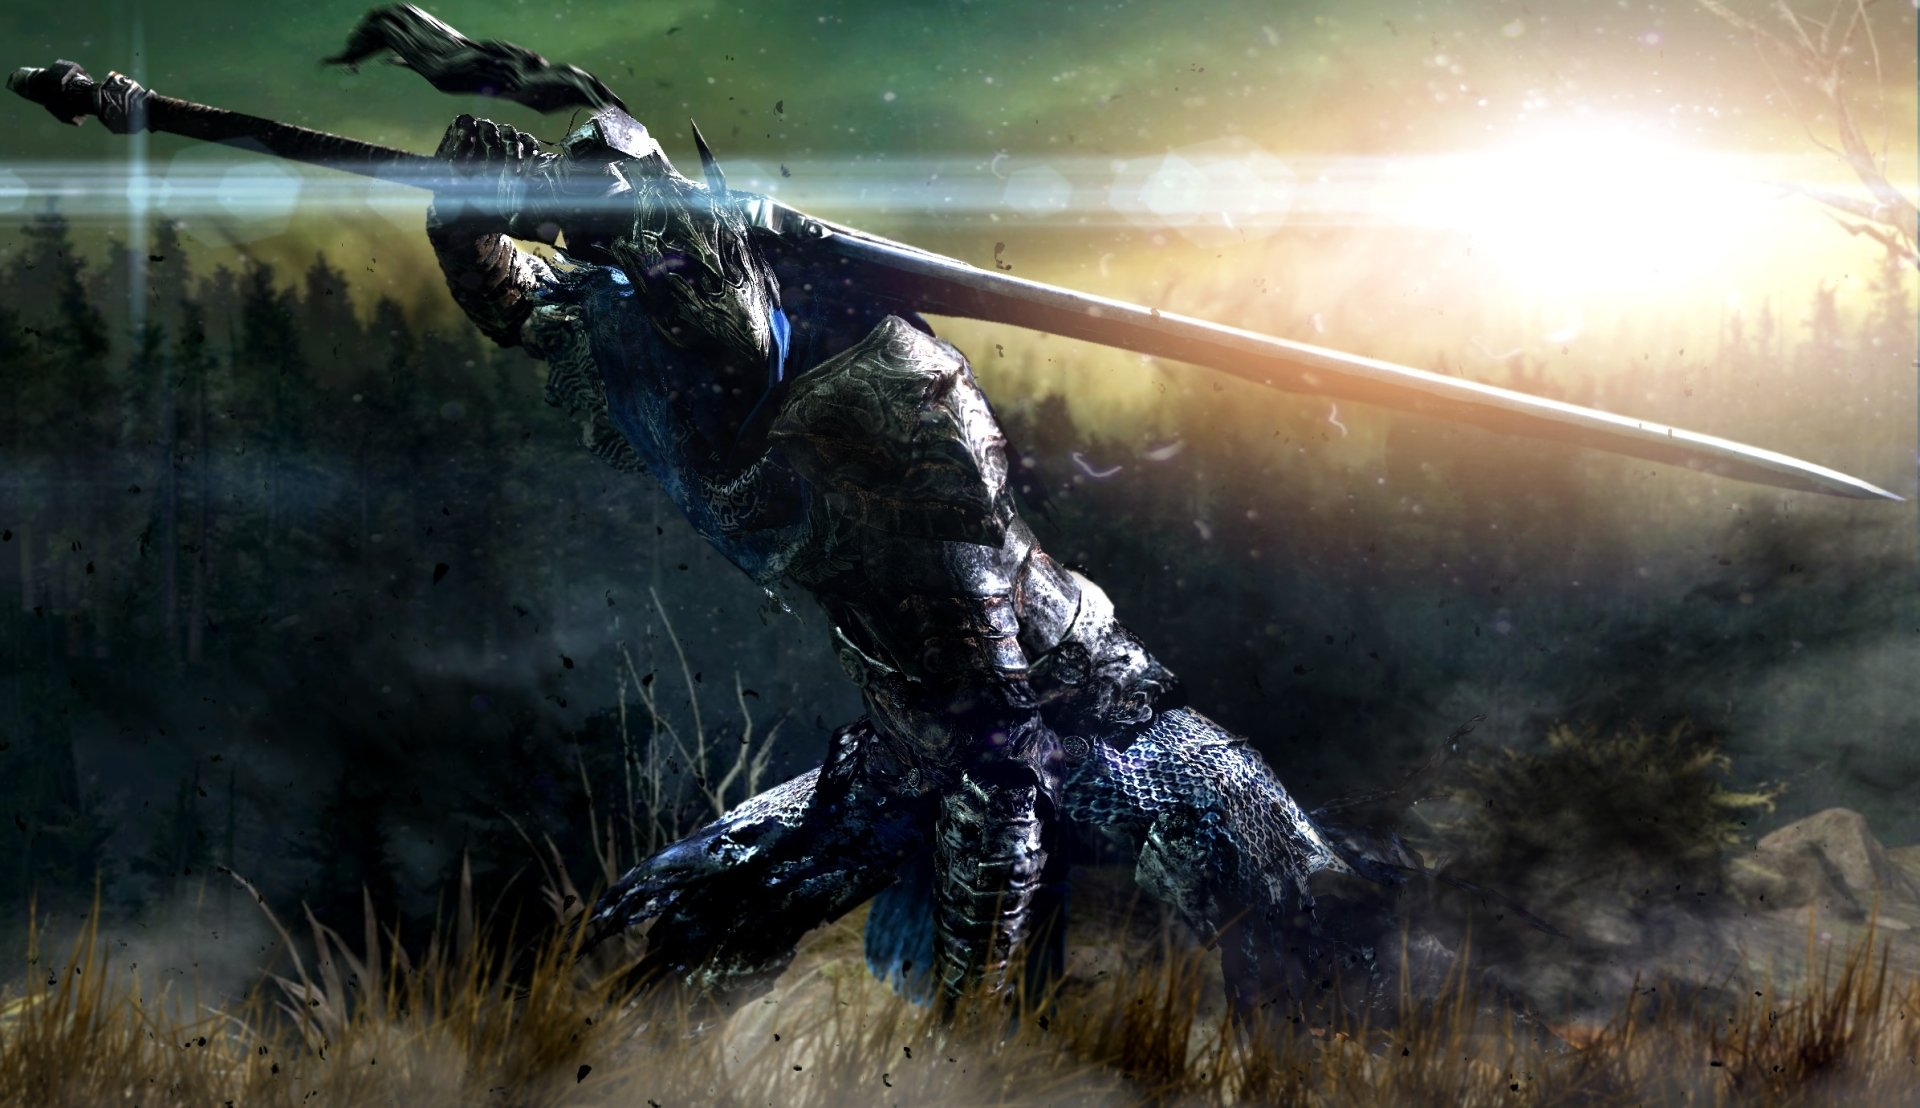 Video Game - Dark Souls  Artorias (Dark Souls) Sword Warrior Armor Wallpaper